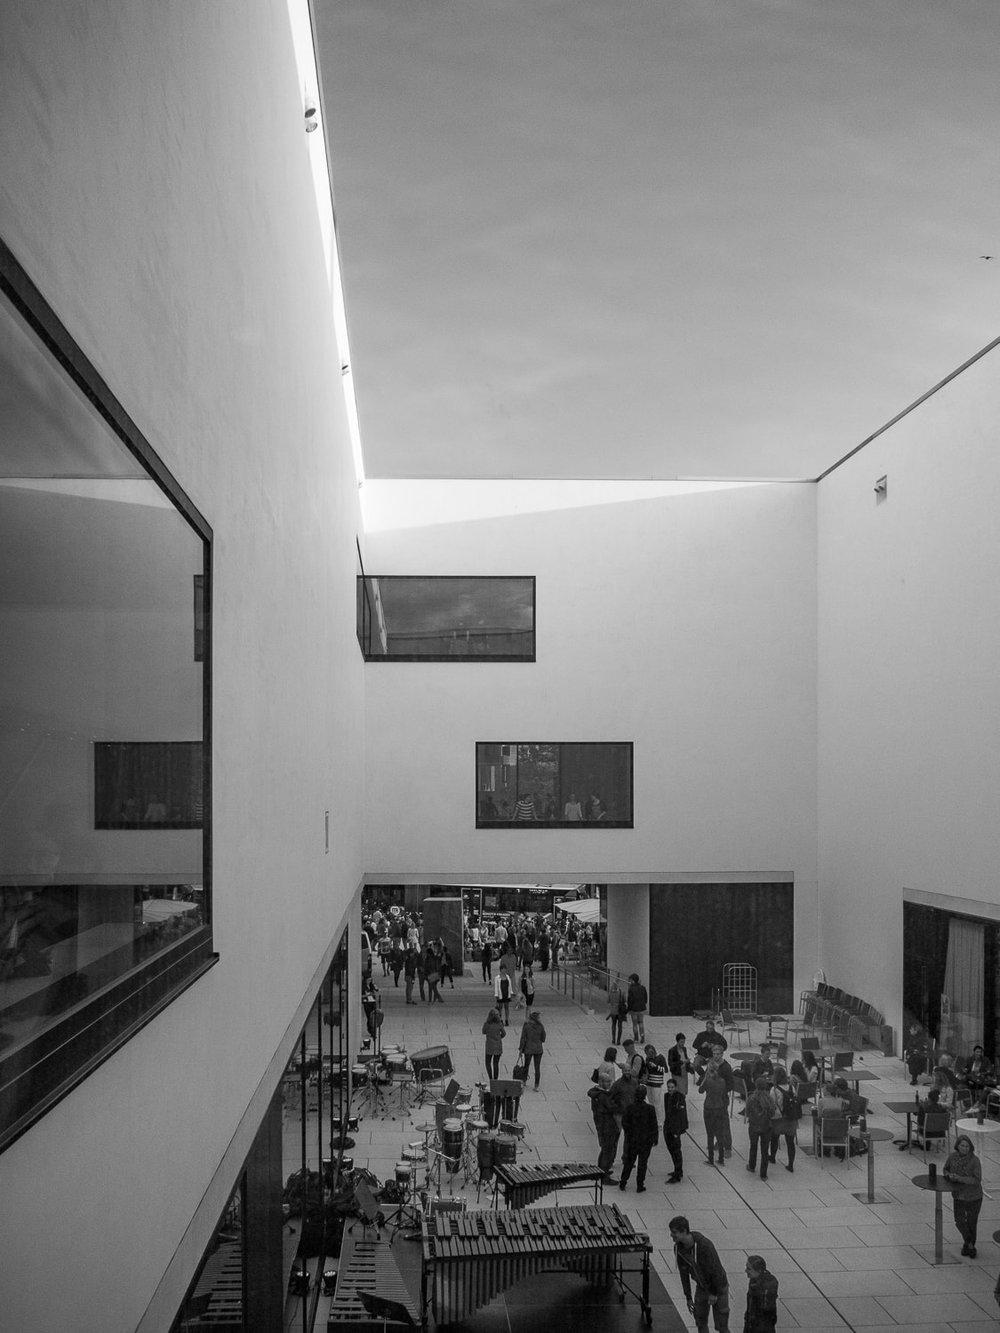 07.09.19.46.38 - LWL Museum Muenster.jpg